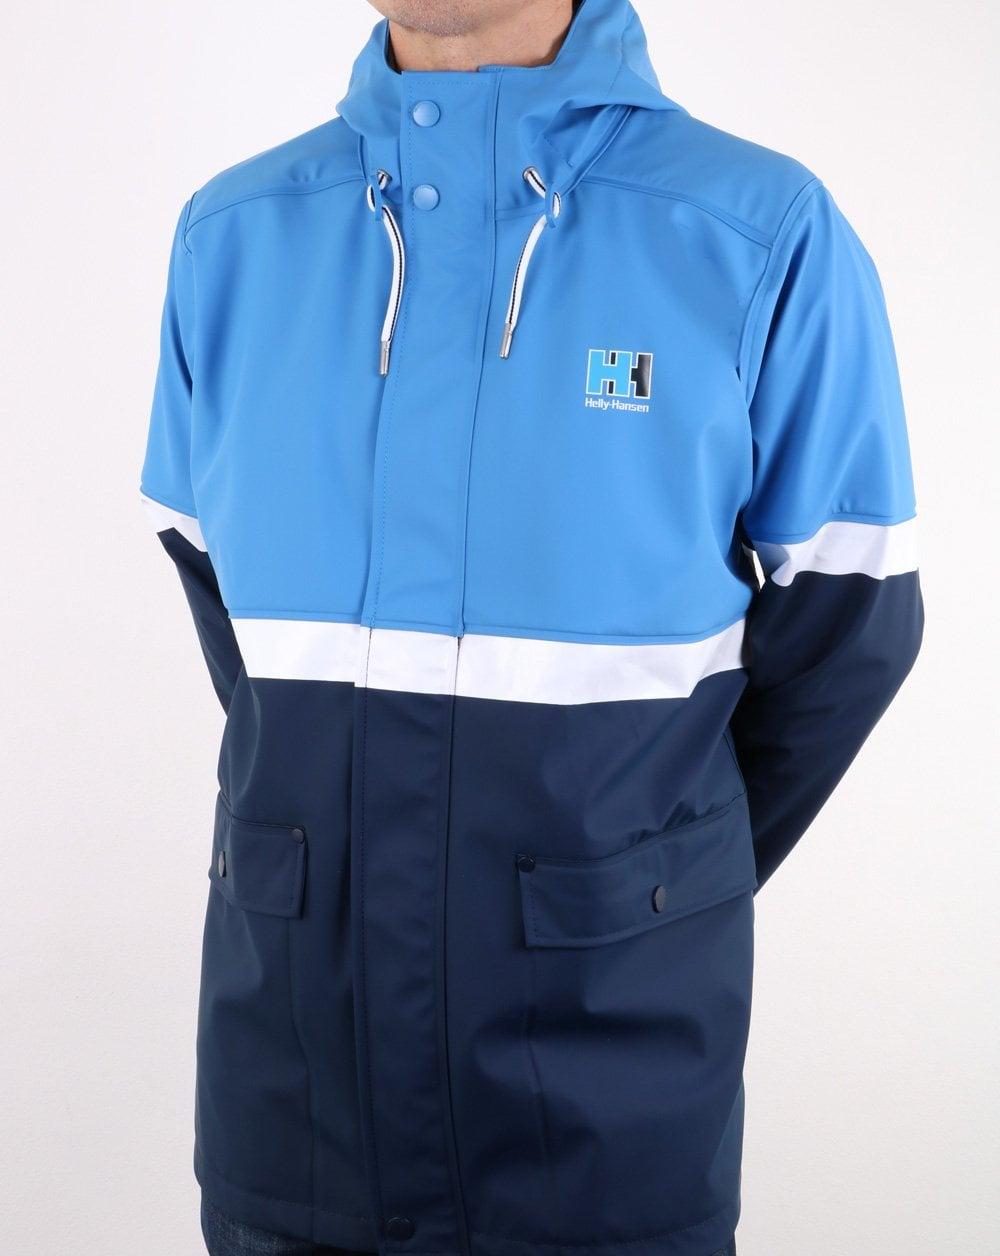 5861225d3c Helly Hansen Rain Jacket, Blue/Navy | 80s casual classics